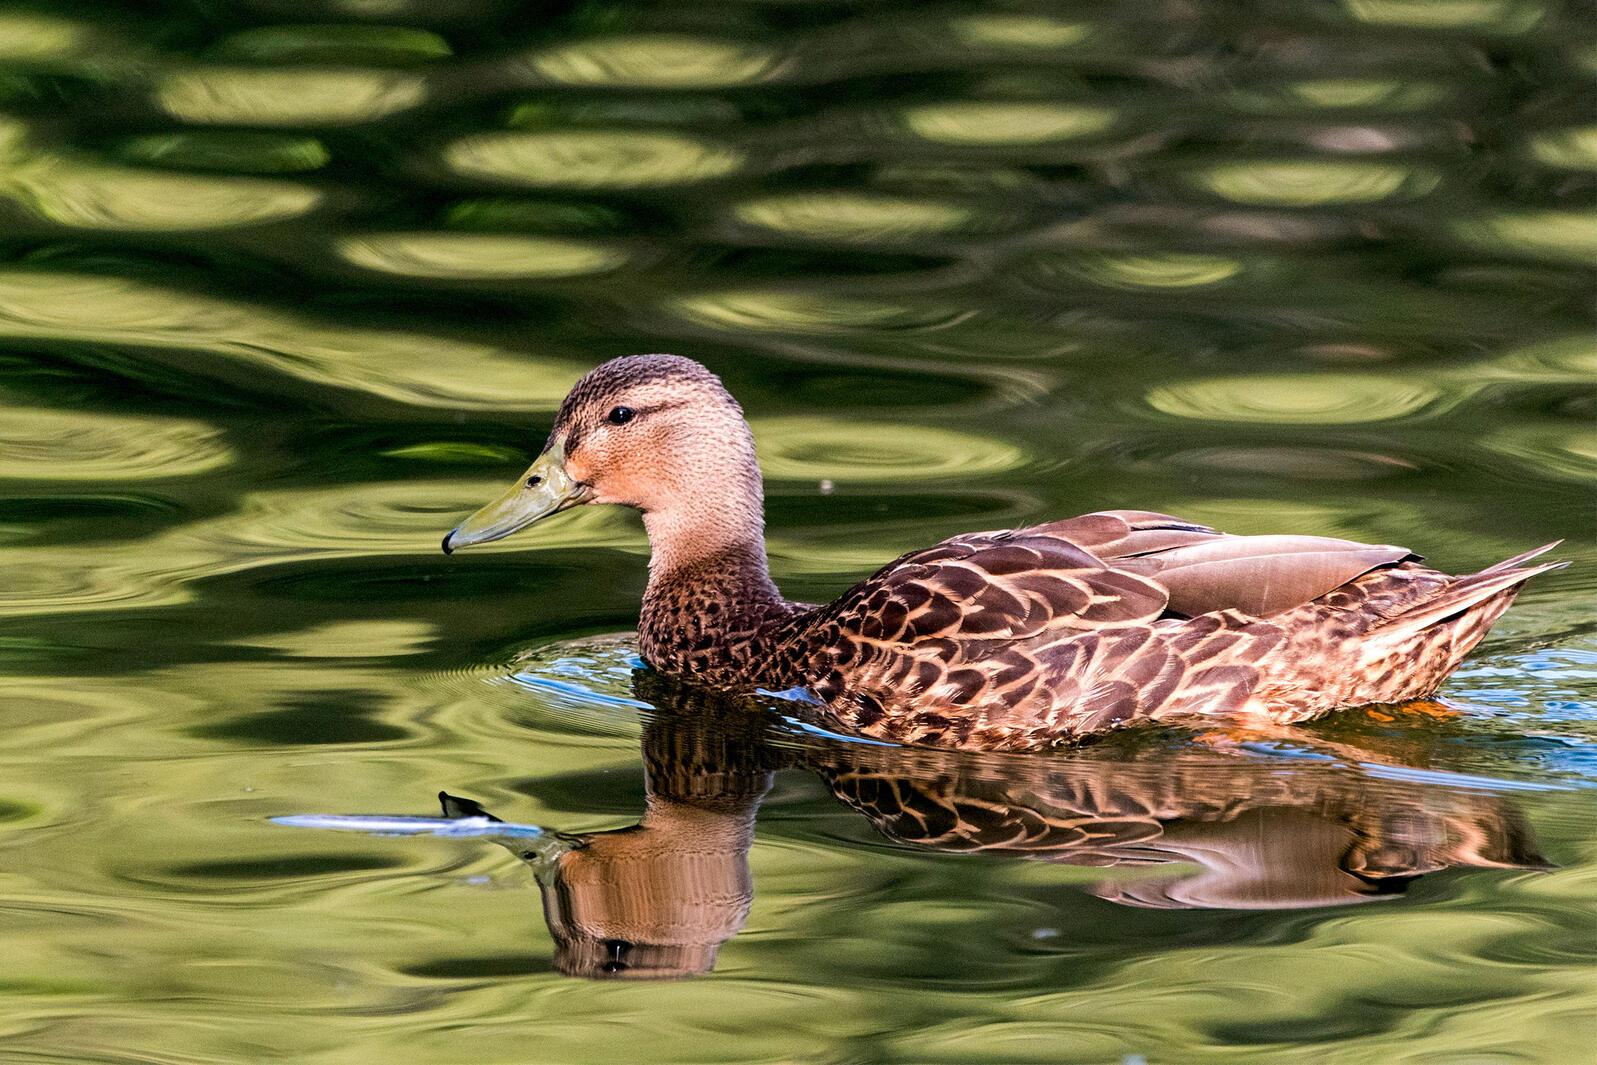 Mexican Duck. Ramon Fregoso/Alamy